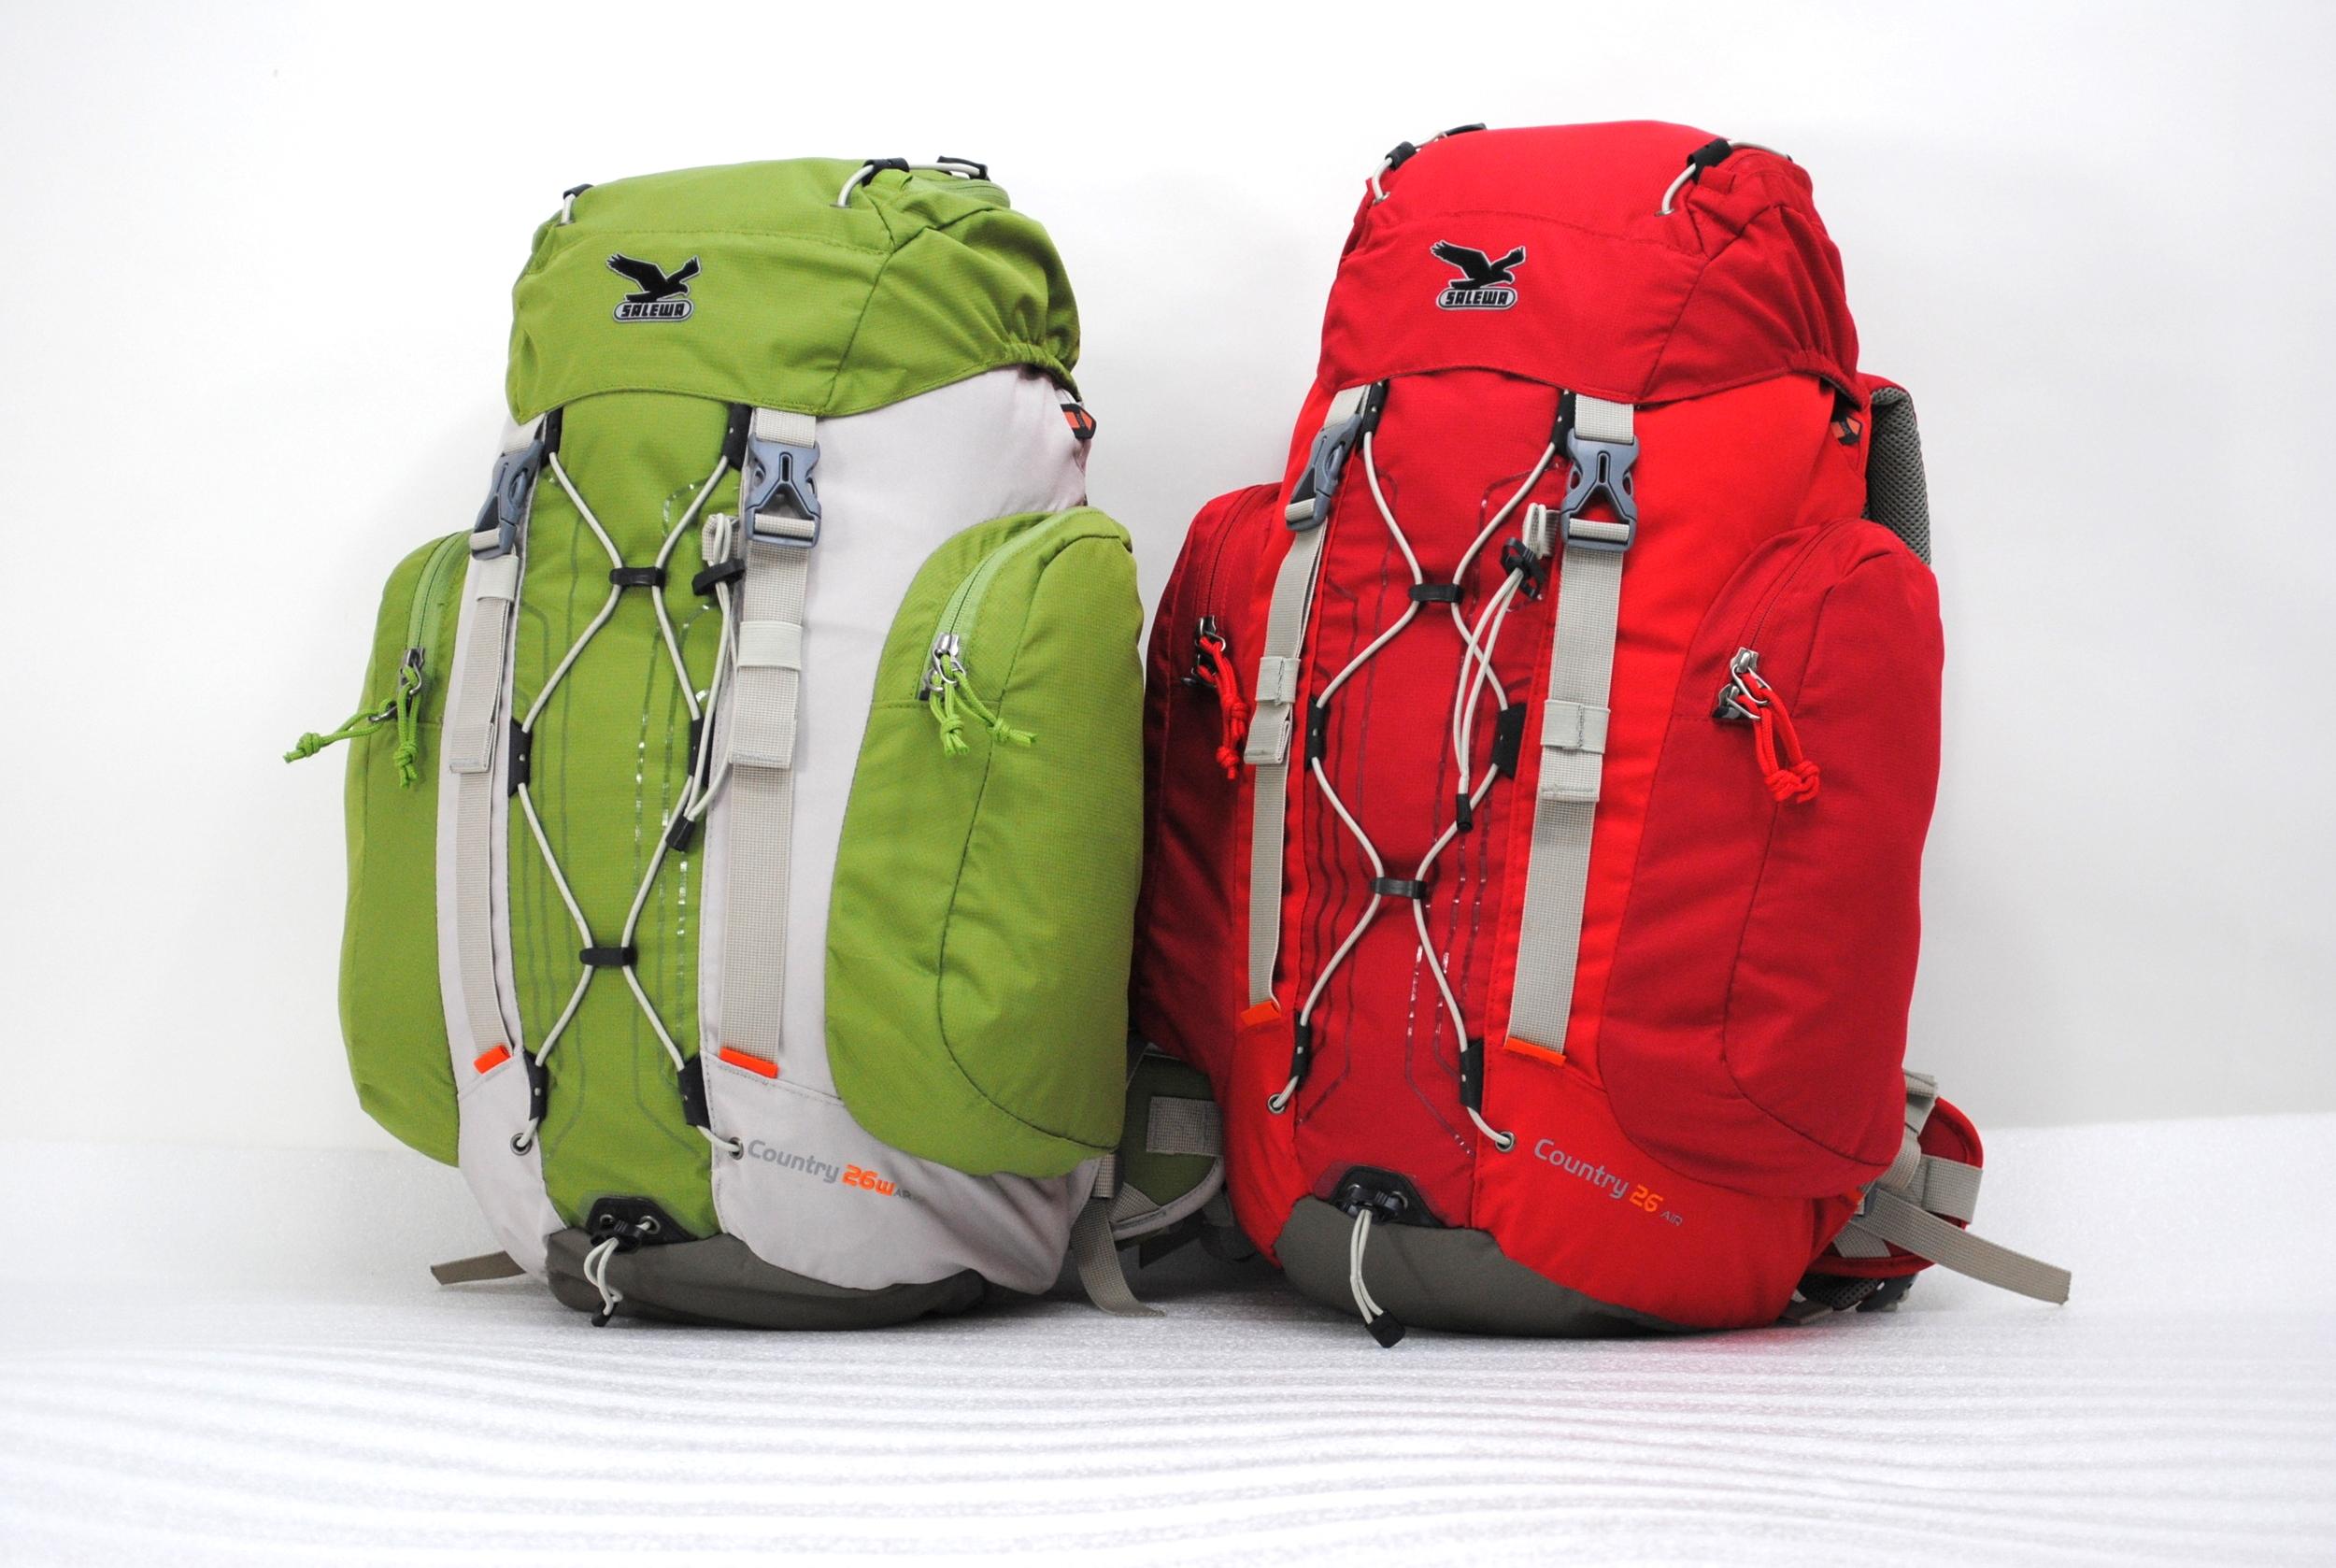 40 Liter Travel Backpack